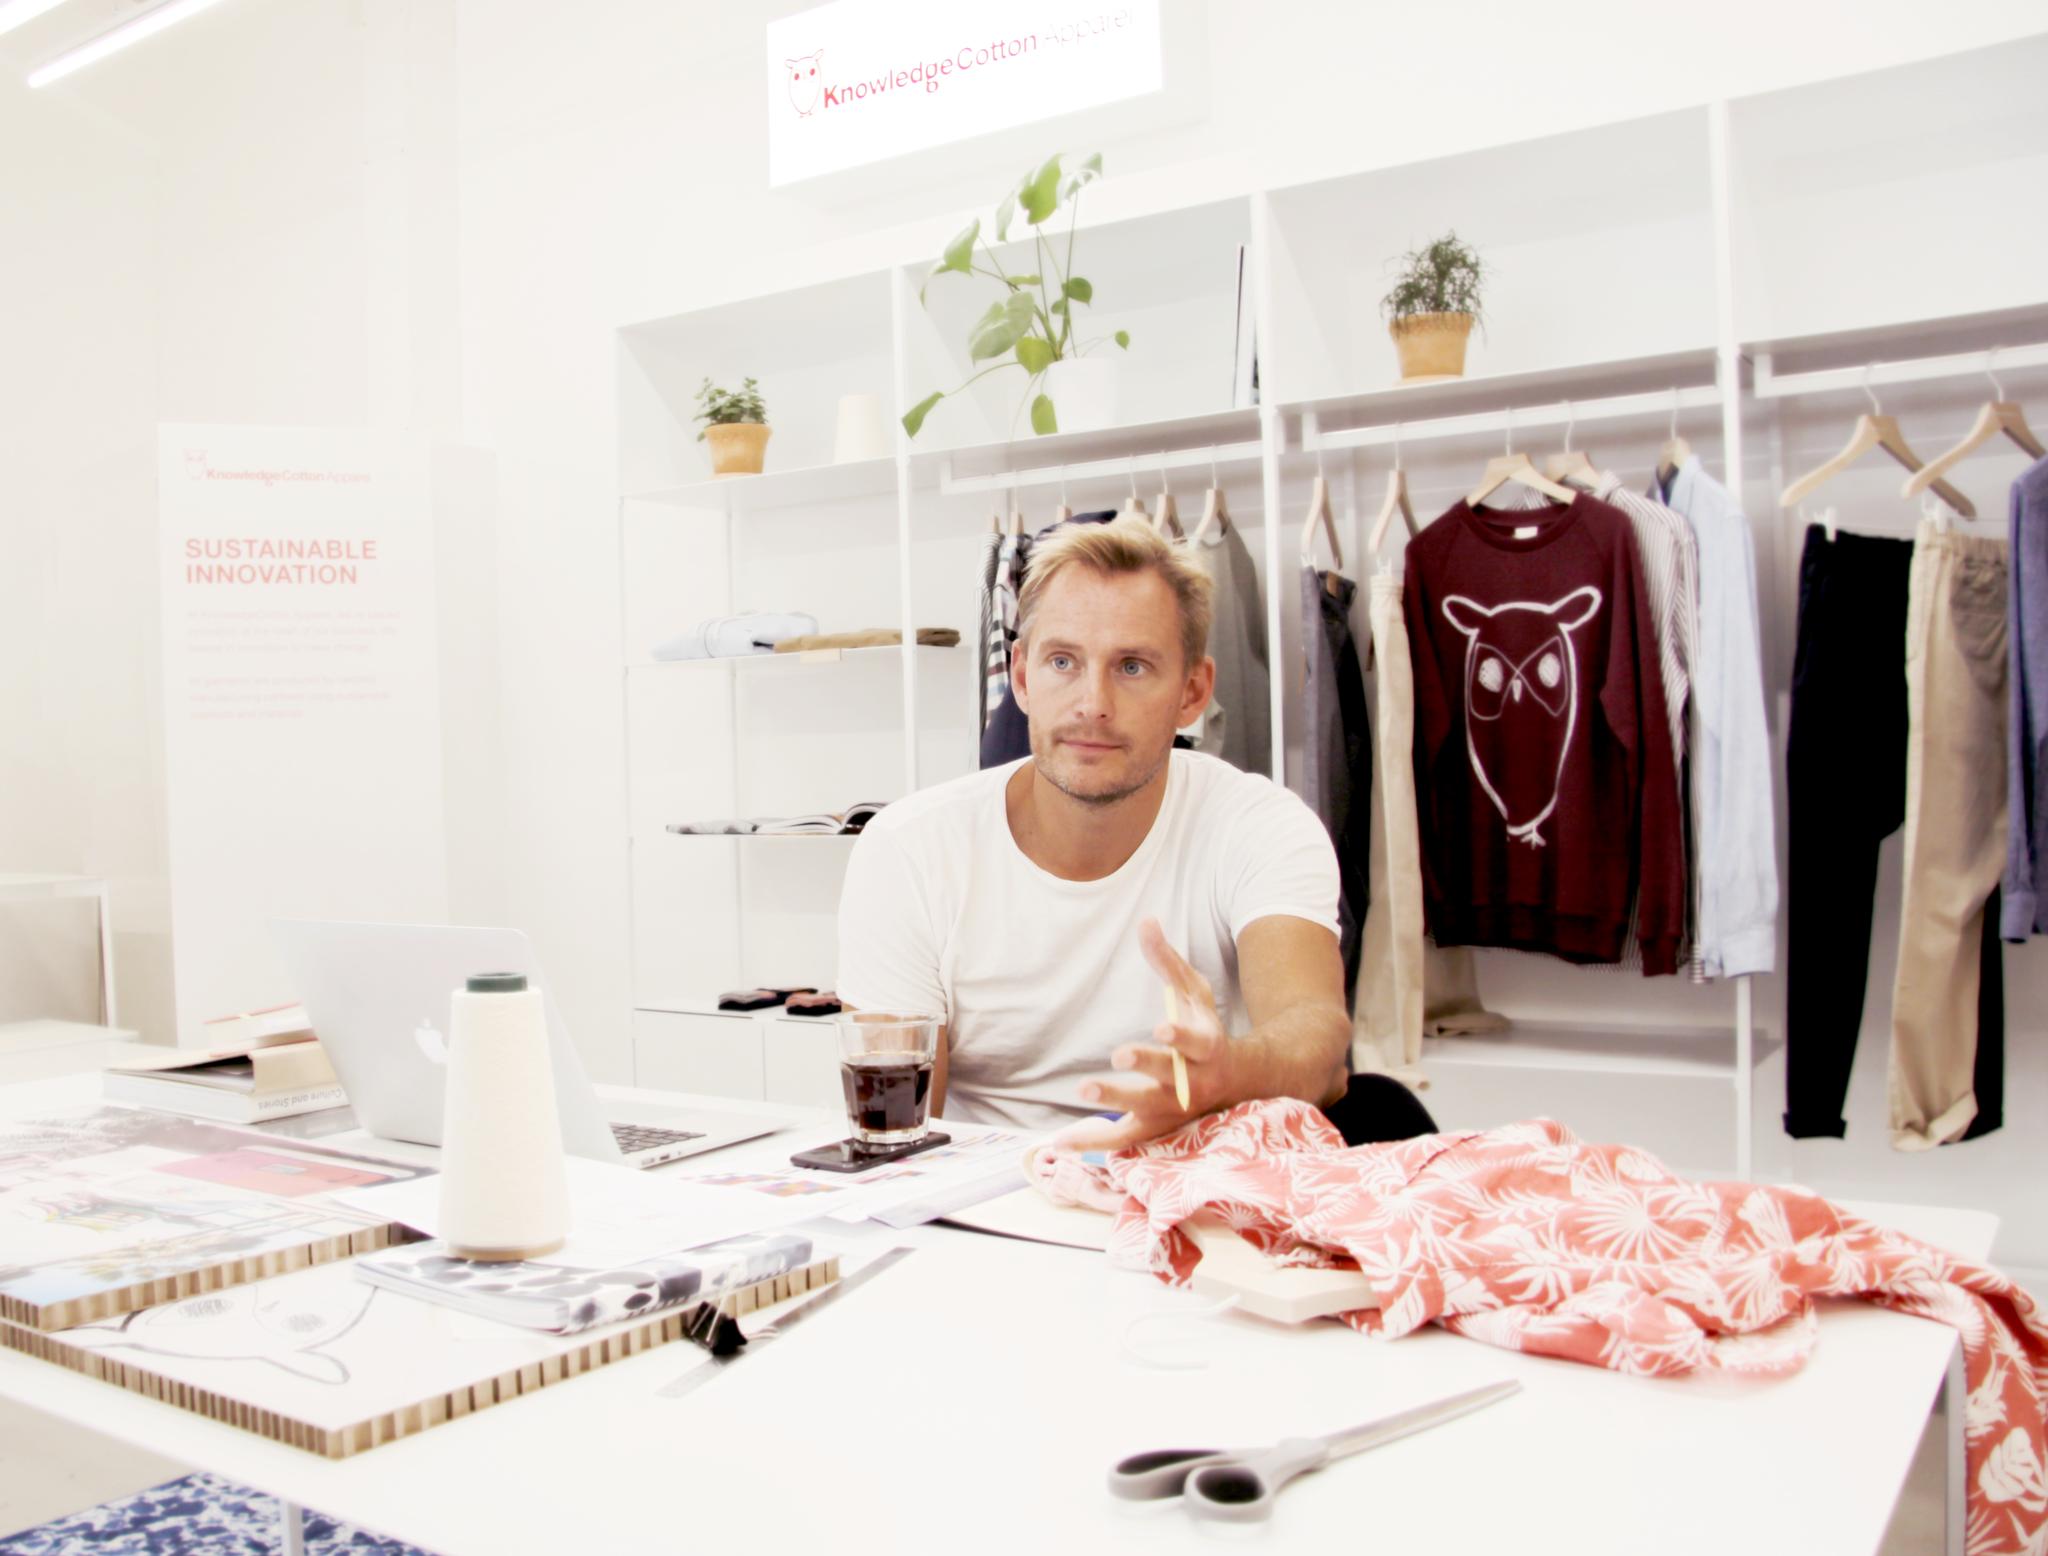 mads-morue-ceo-knowledge-cotton-apparel